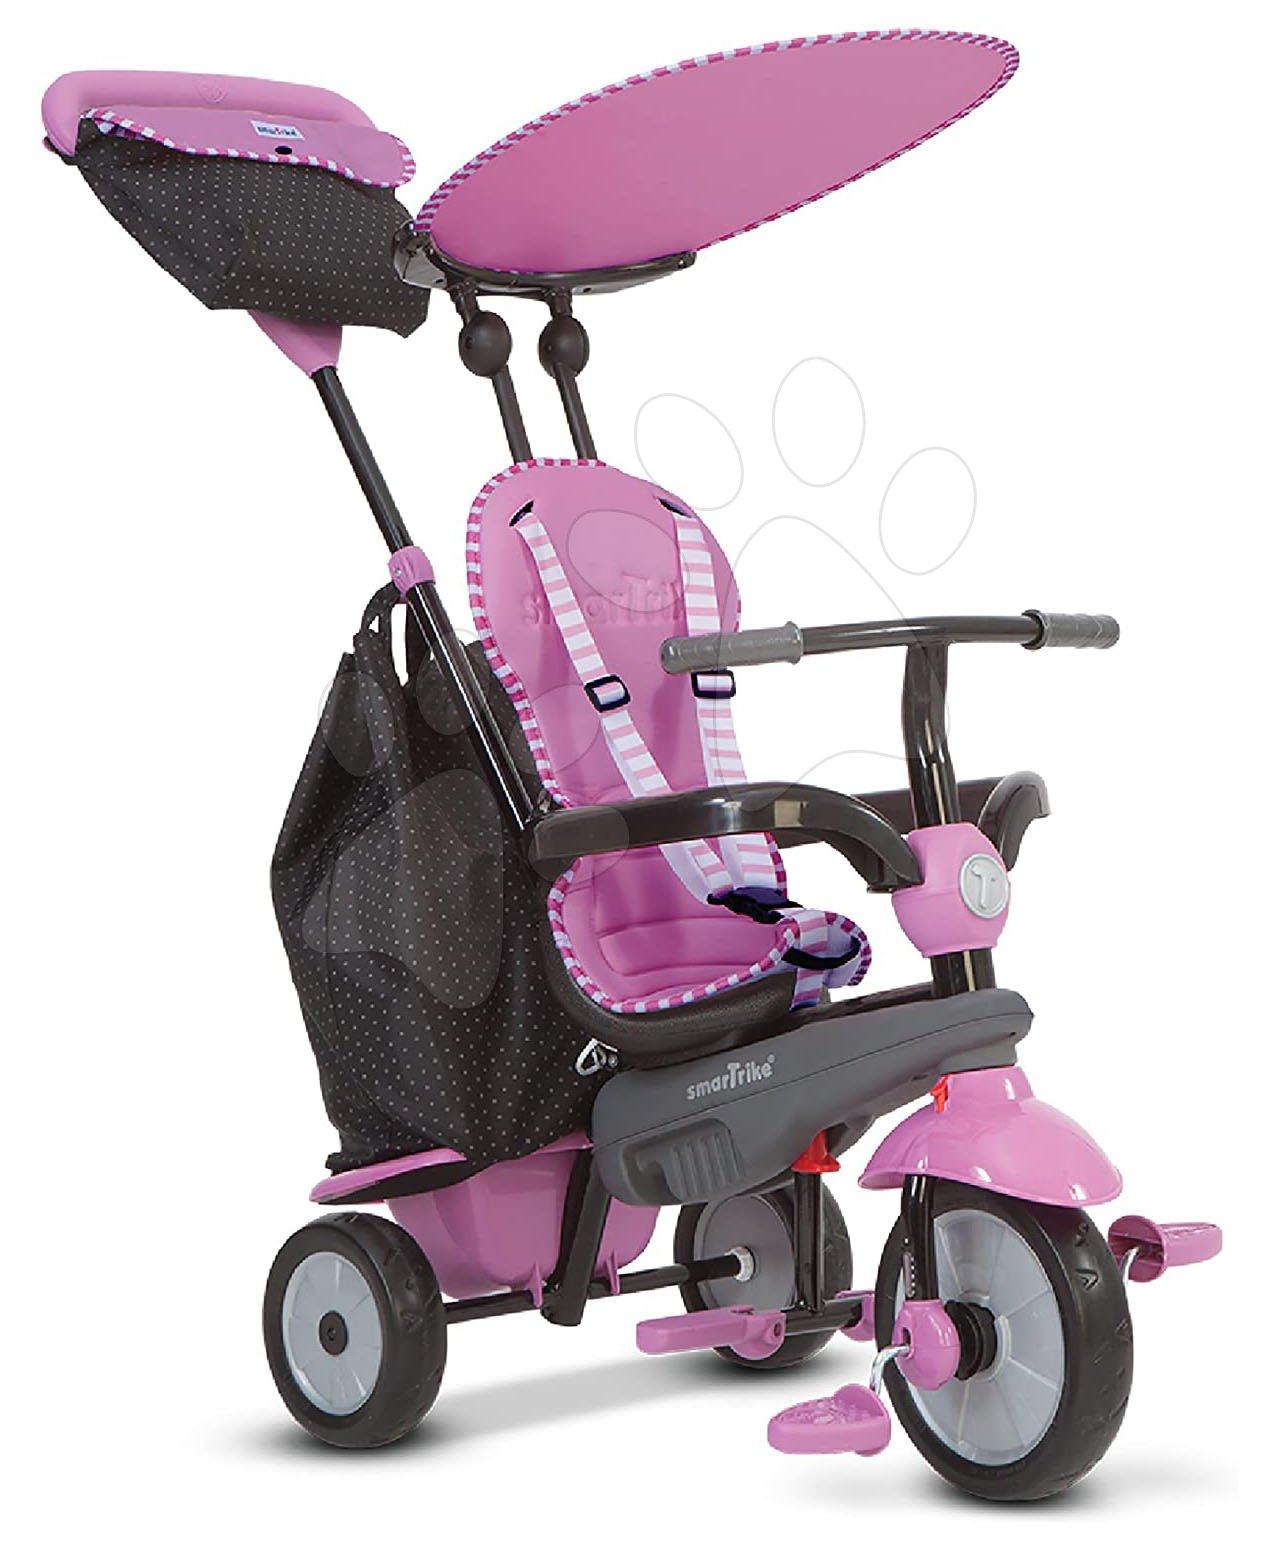 Trojkolky od 10 mesiacov - Trojkolka Shine 4v1 Touch Steering Grey&Pink smarTrike šedo-ružová od 10 mes